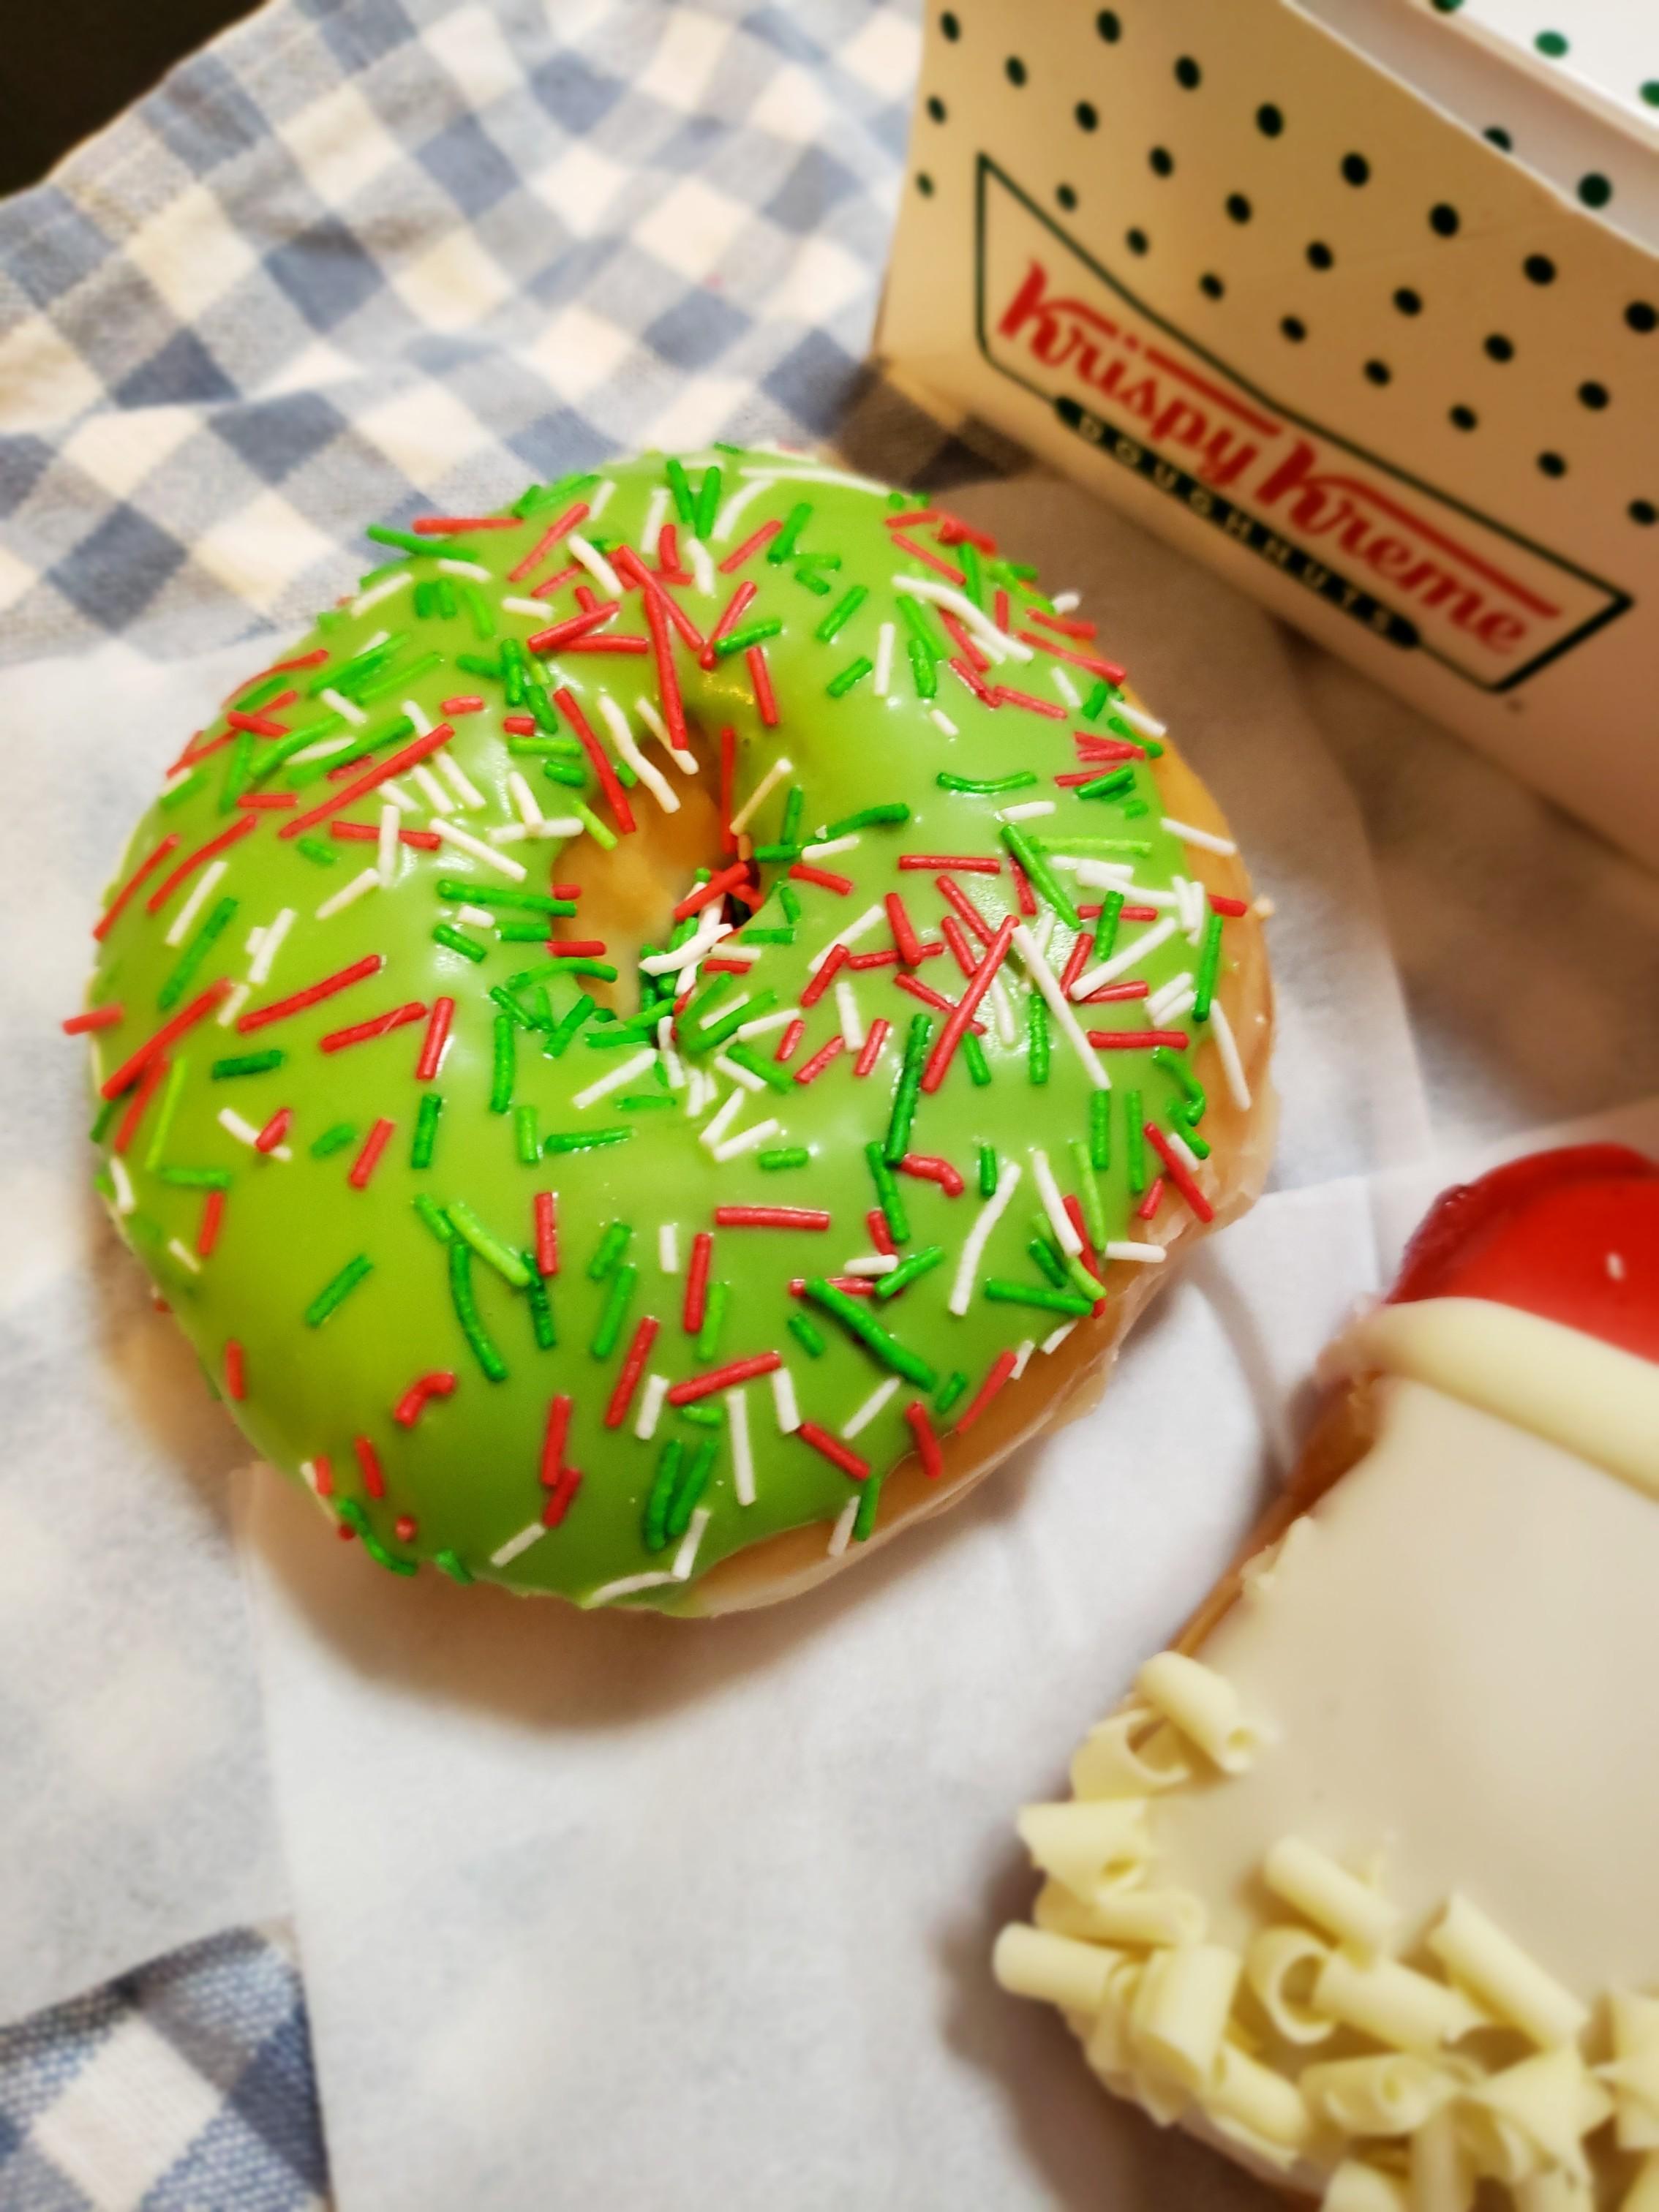 【Krispy Kreme DOUGHNUTS】かわいいドーナツでクリスマス気分♪_2